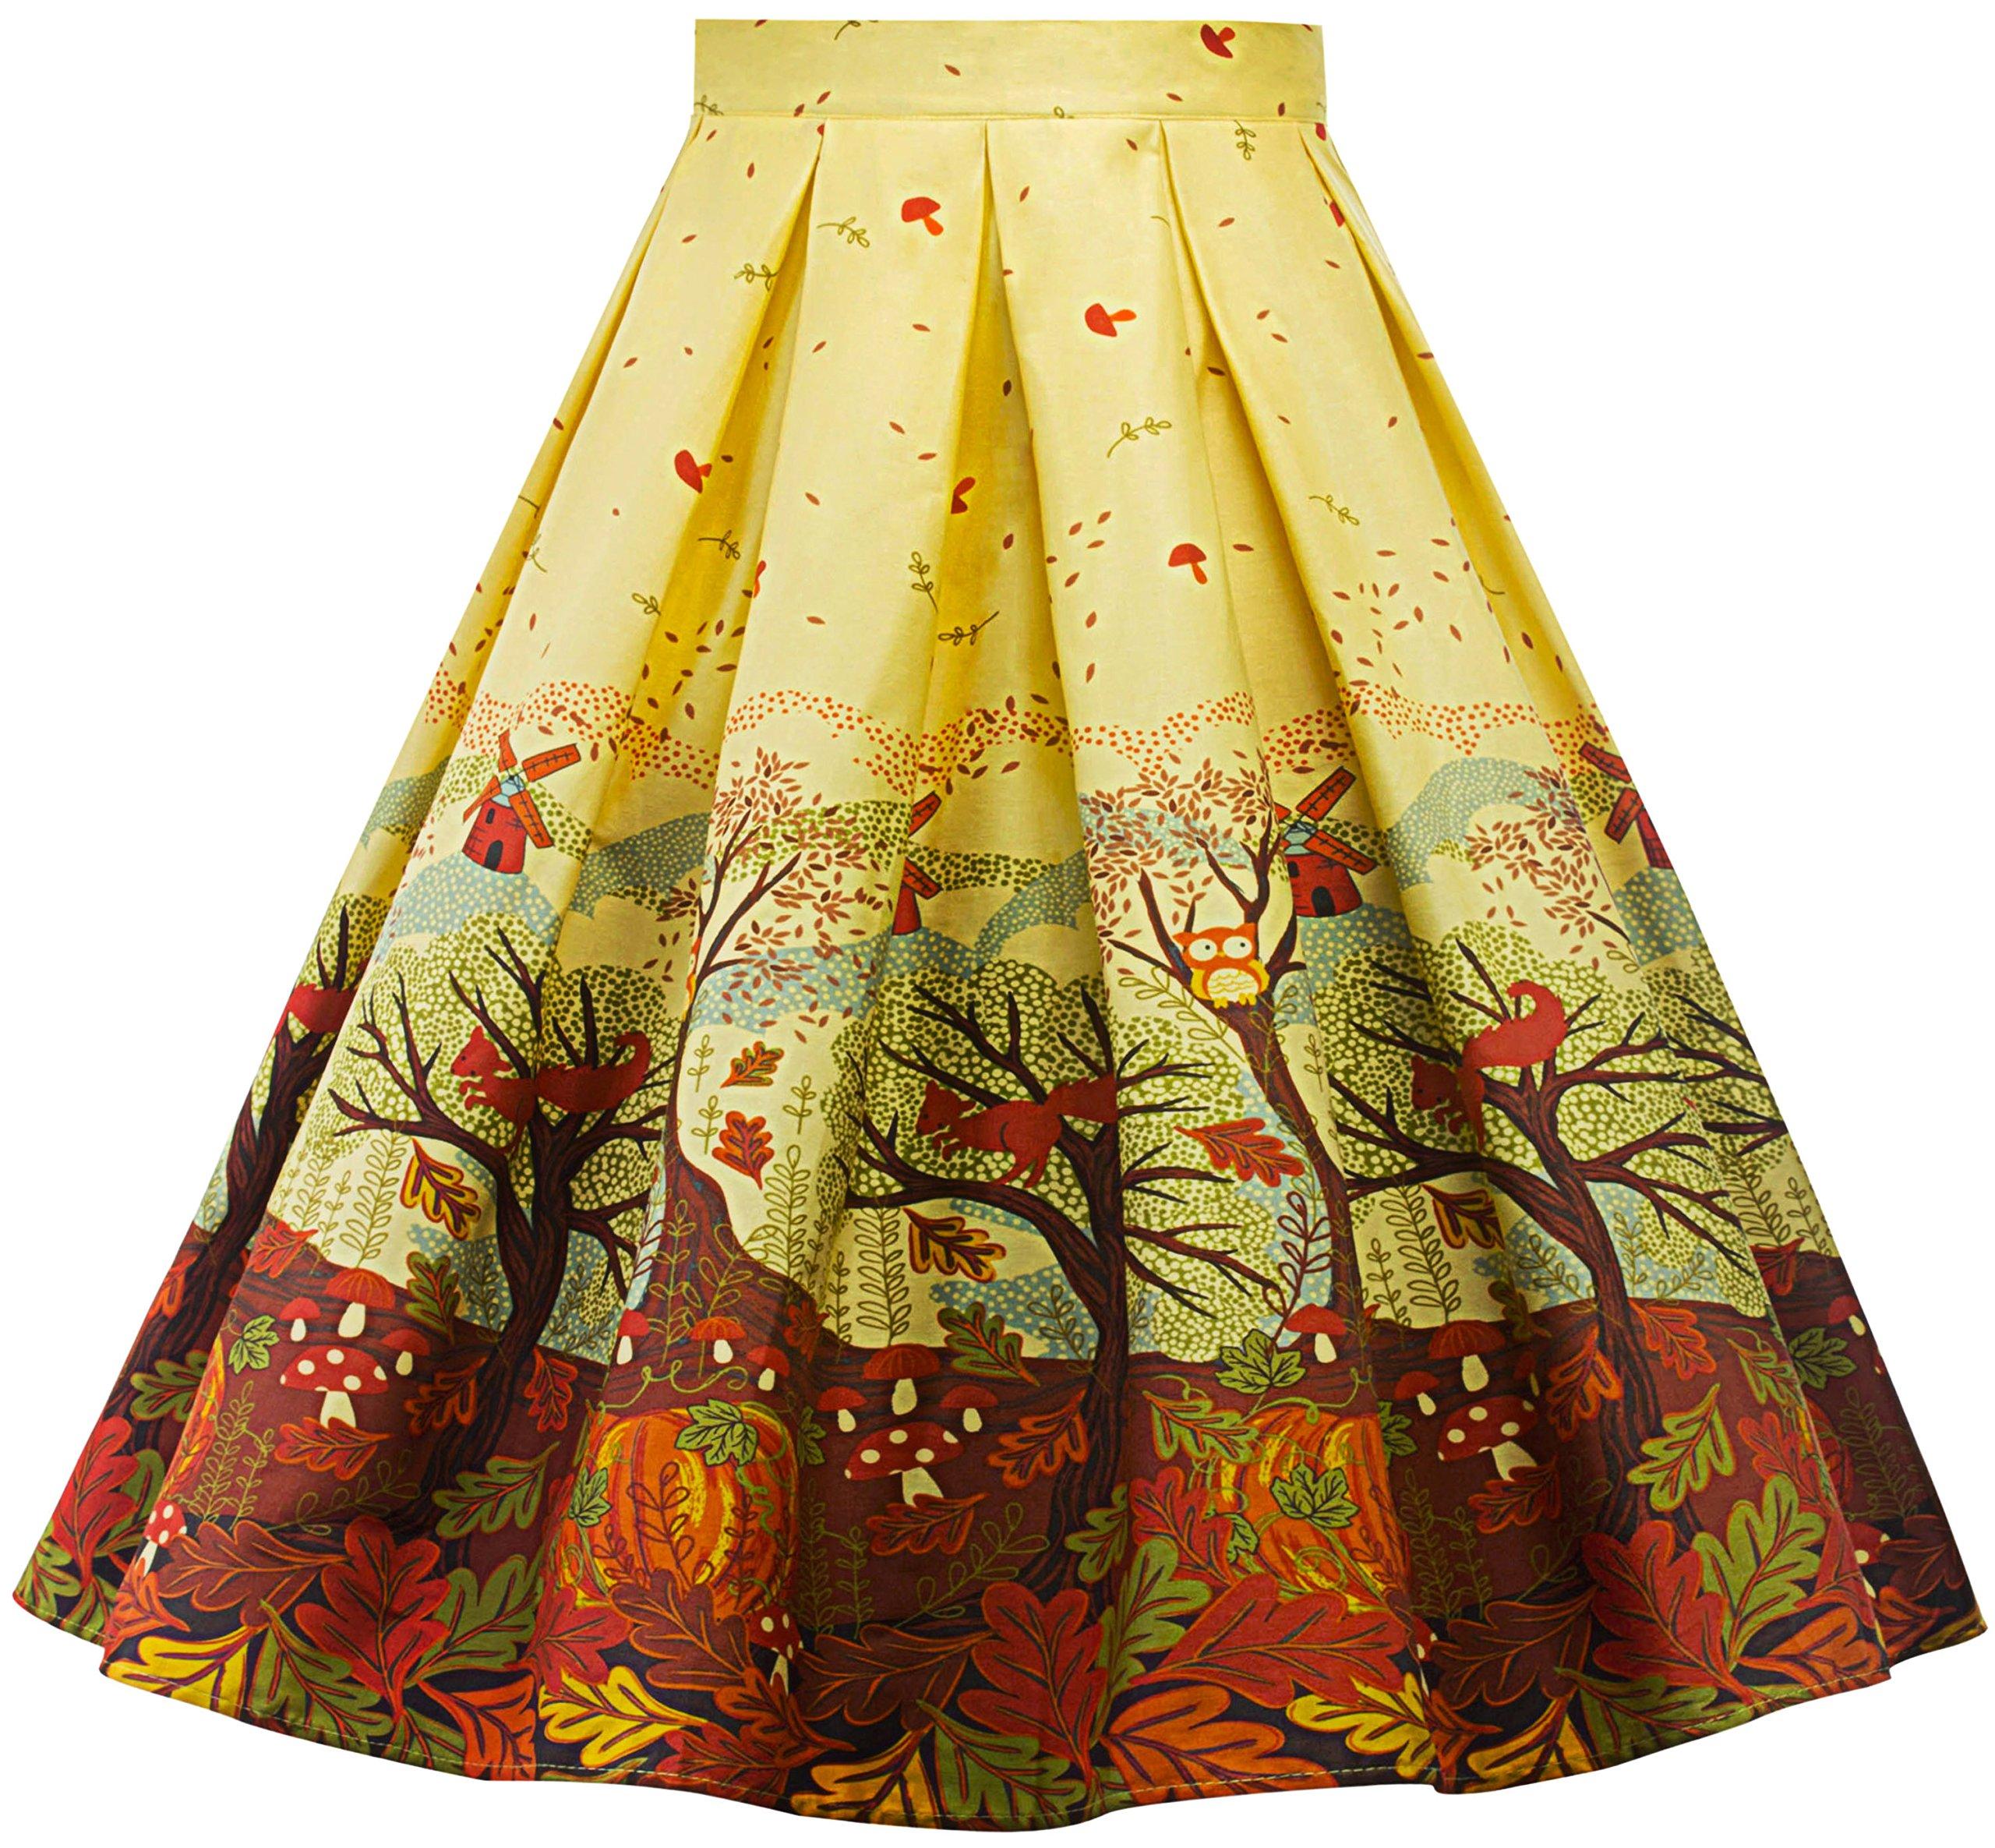 Womens Vintage a Line Skirt High Waist Pleated Flared Midi Skirts R02 (Yellow, L)